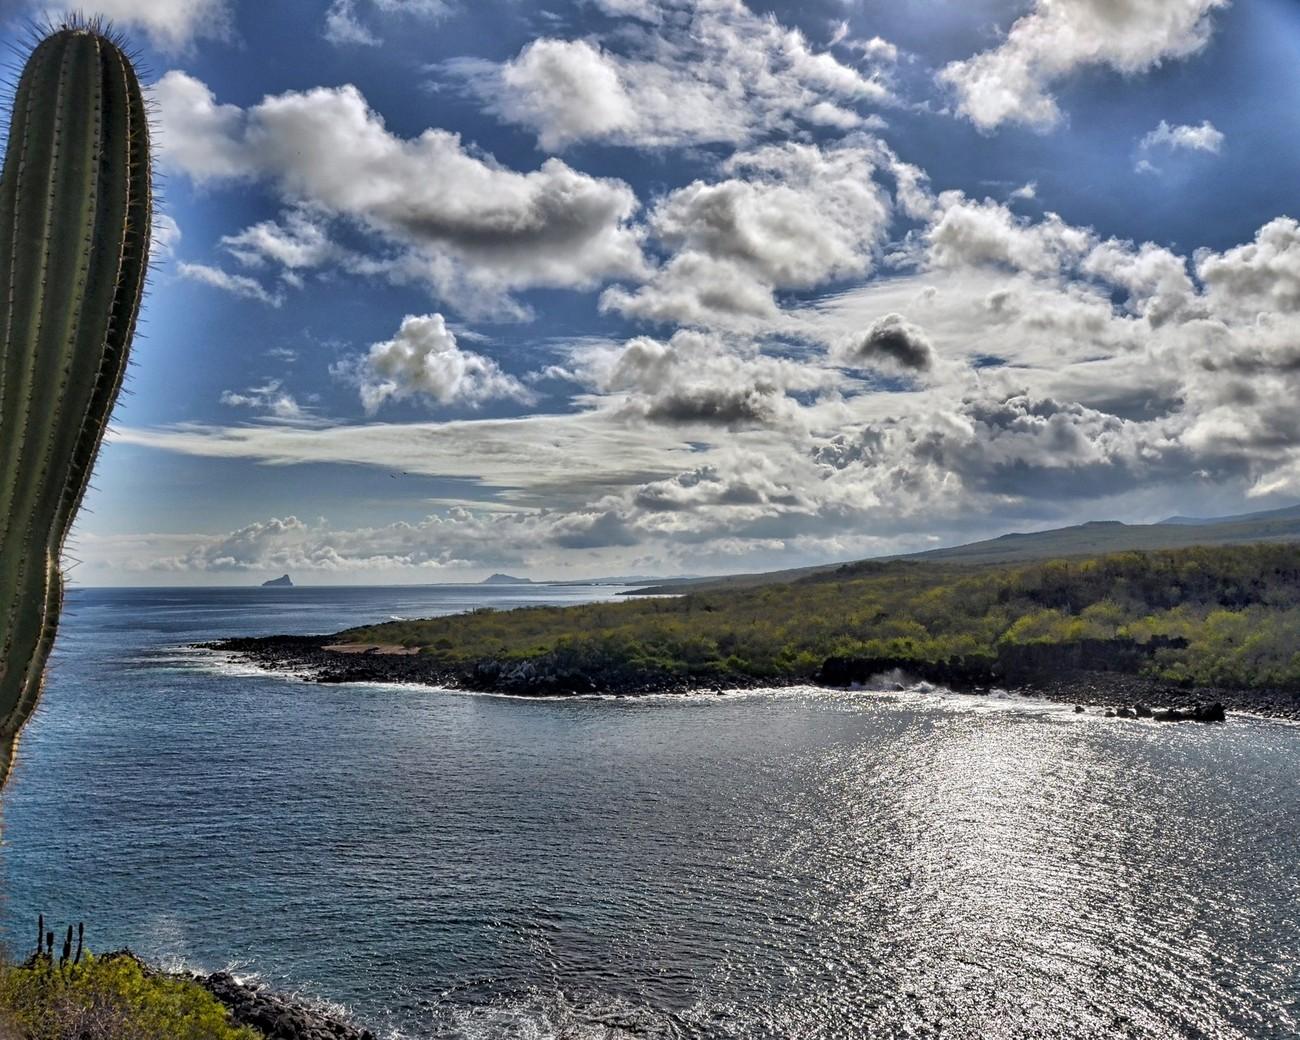 View of the archipelago of volcanic islands from Puerto Baquerizo Moreno on San Cristobal Island.